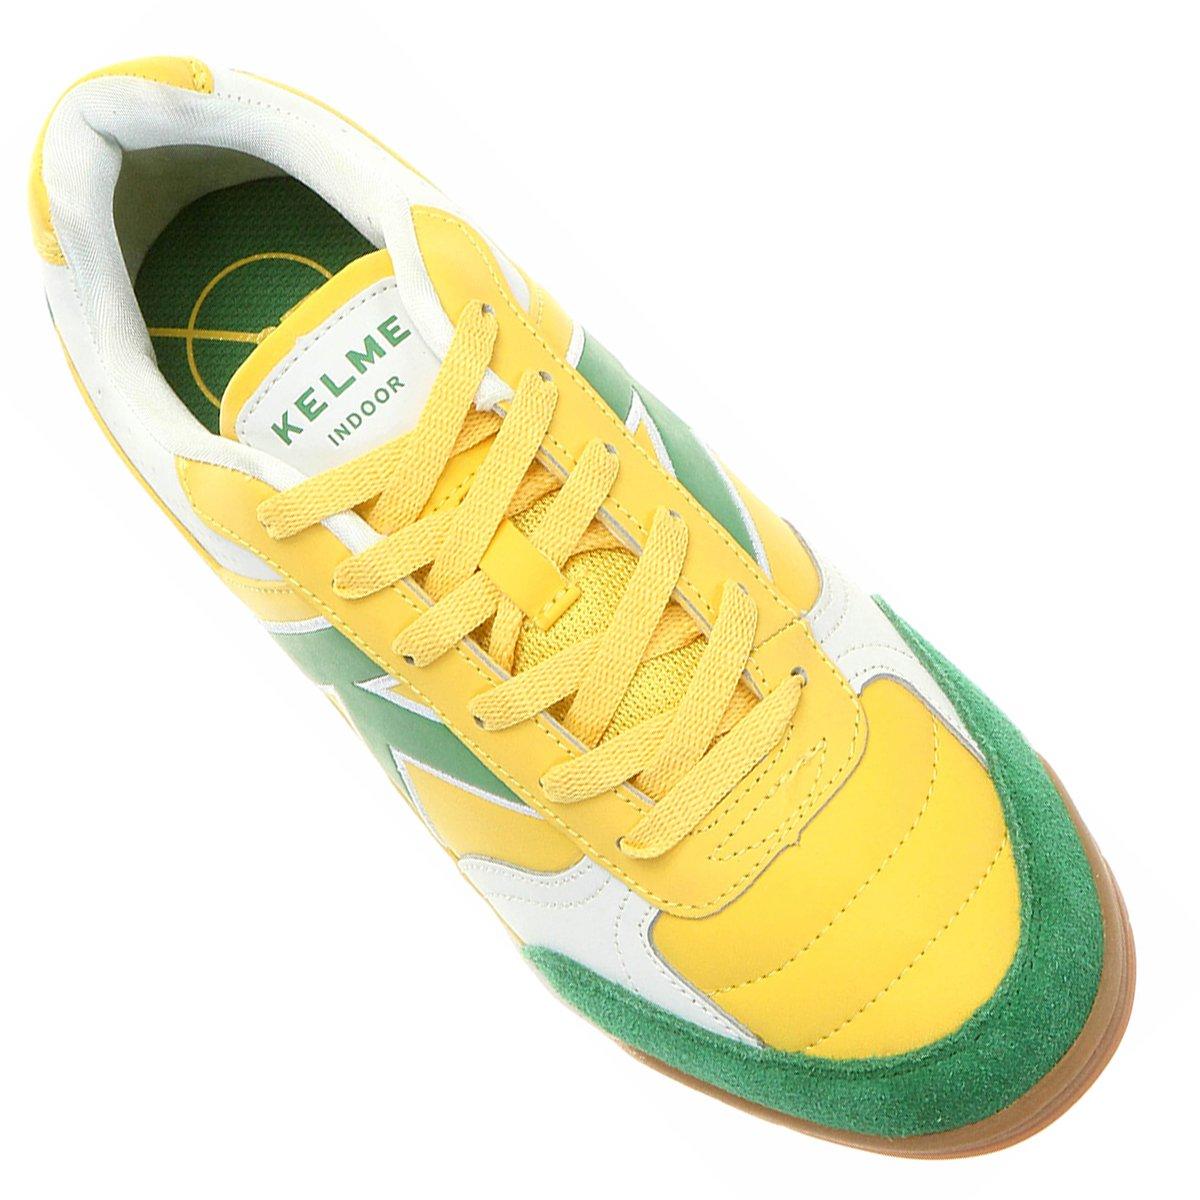 b12c61d3b1 ... Chuteira Kelme Fultac Futsal. Chuteira Kelme Fultac Futsal - Amarelo+ Verde